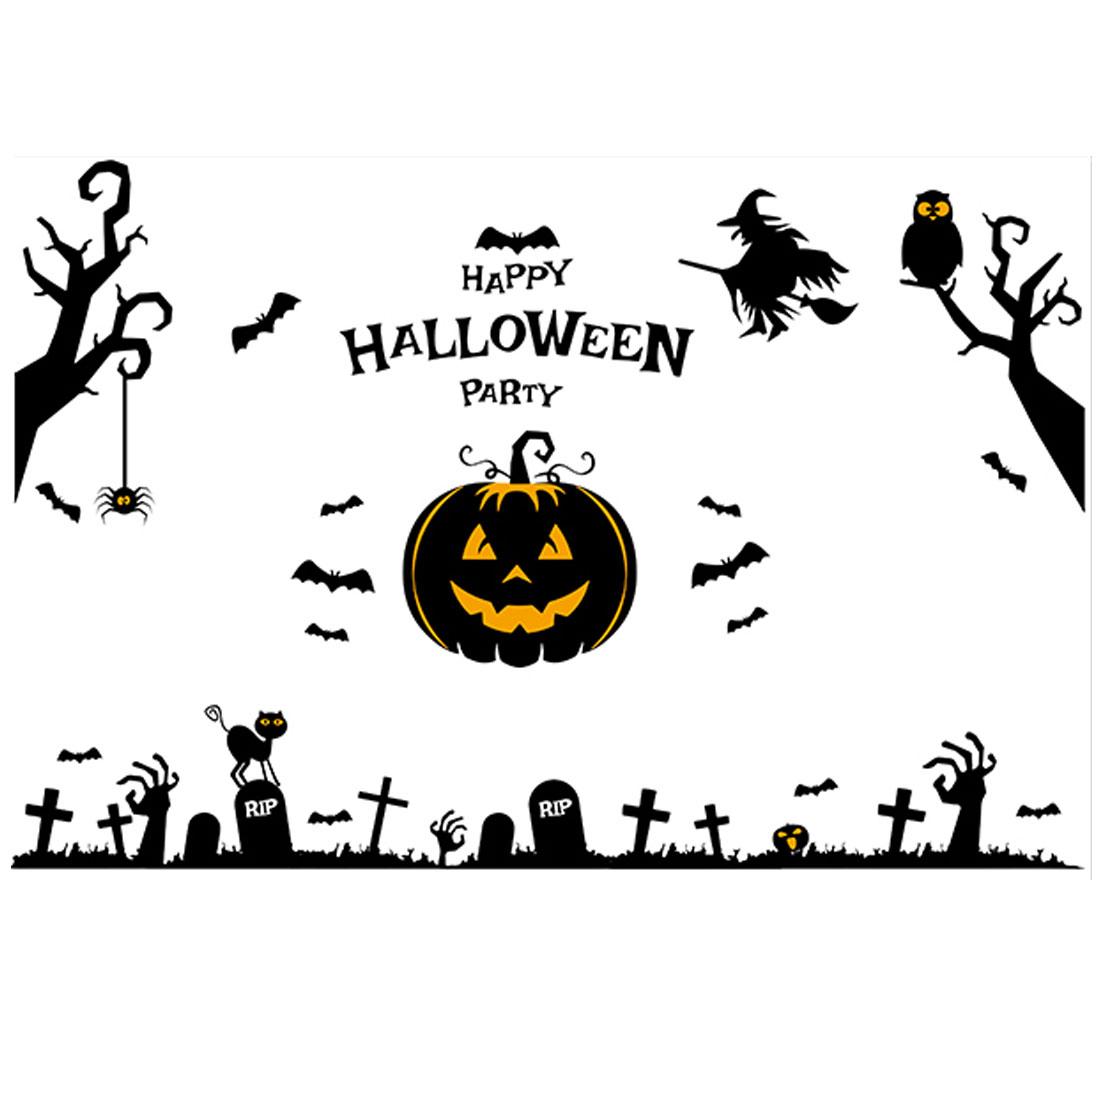 Home PVC Pumpkin Cross Pattern Self-adhesive Halloween Decor Wall Sticker Black